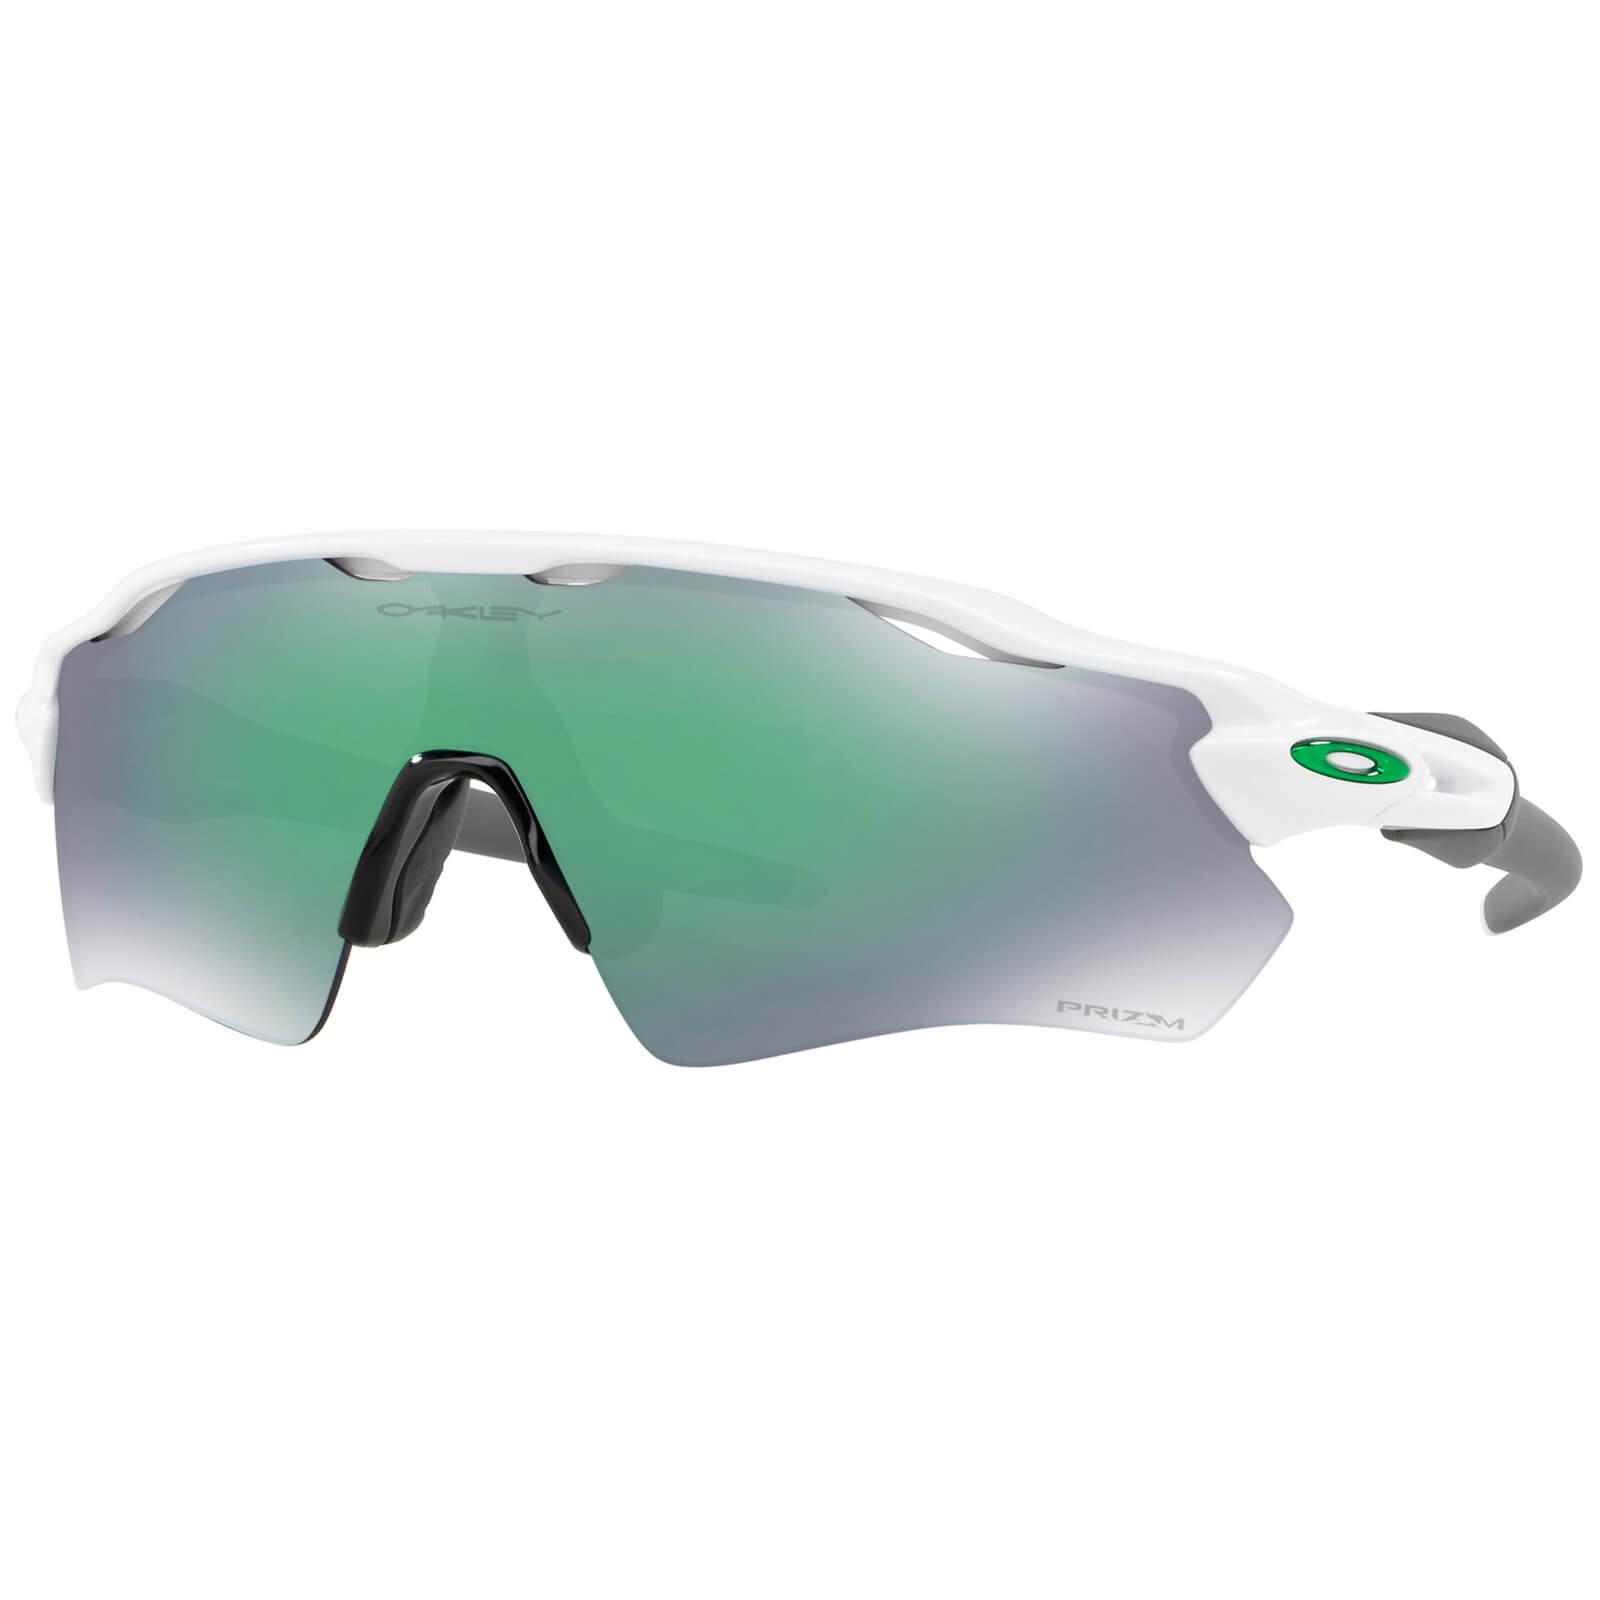 Oakley Radar EV Path Sunglasses - Polished White/Prizm Jade